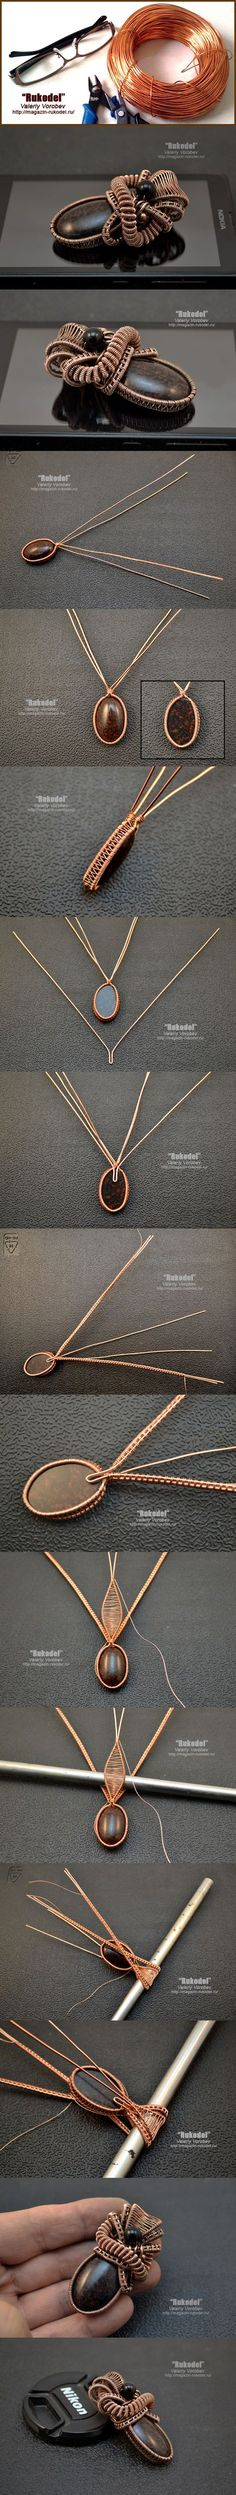 Wire Wrap Pendant - Подвеска из проволоки - http://magazin-rukodel.ru/